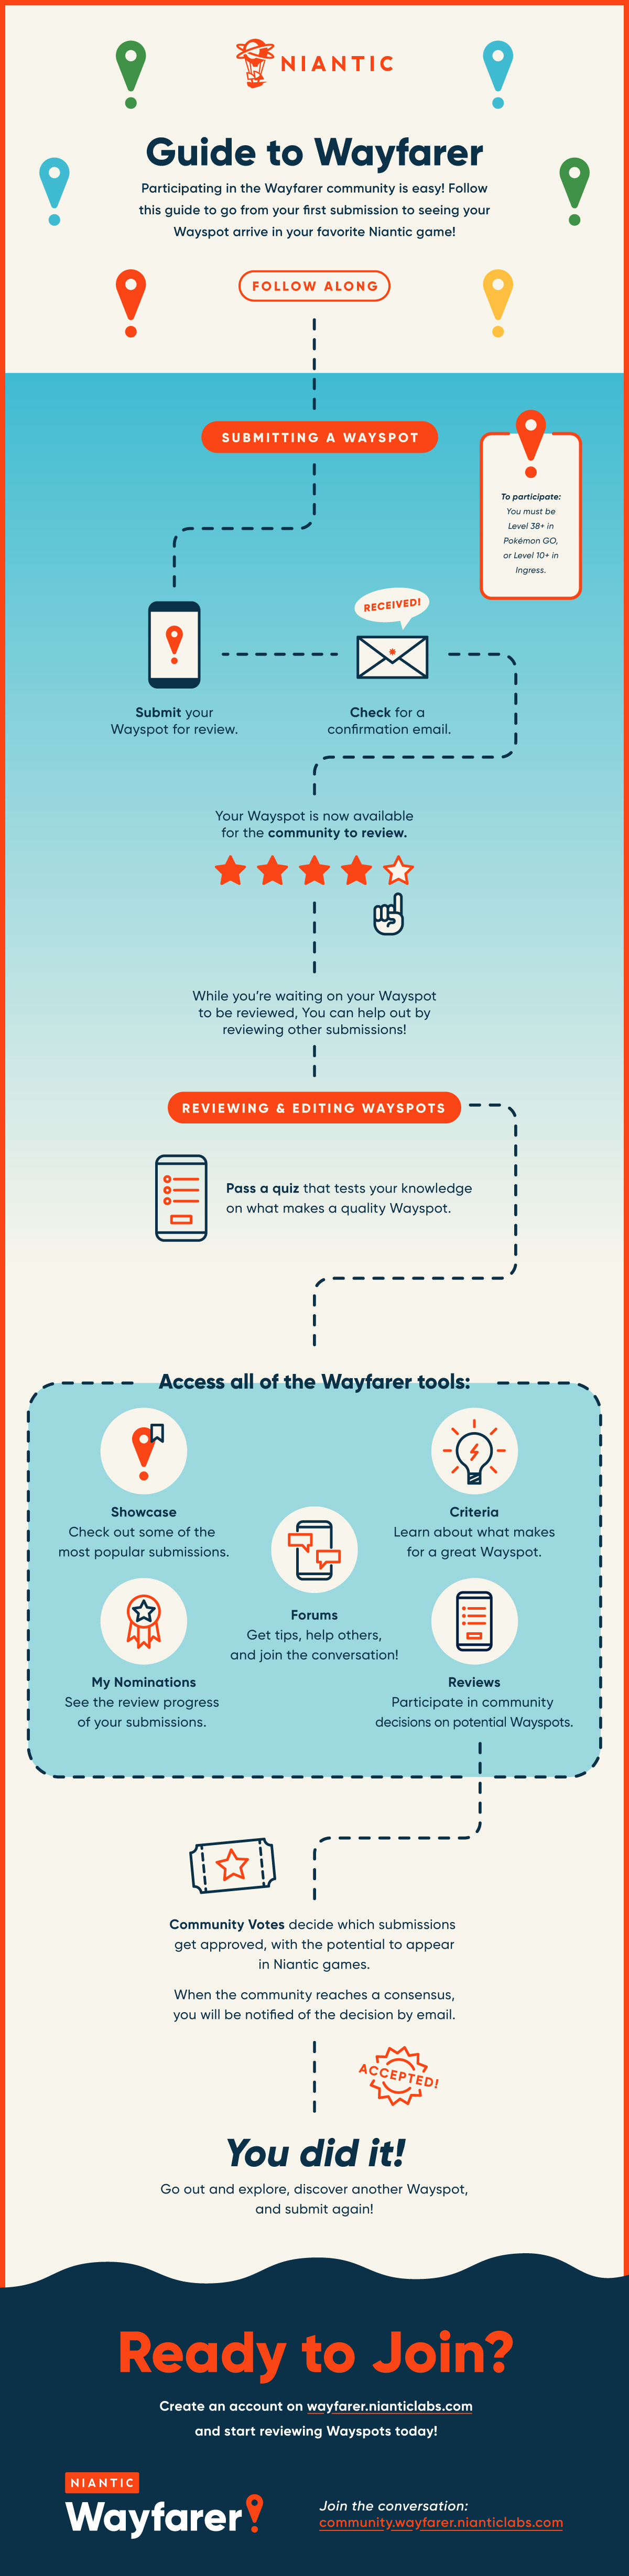 NIA_Wayfarer_Infographic_Blog.jpeg